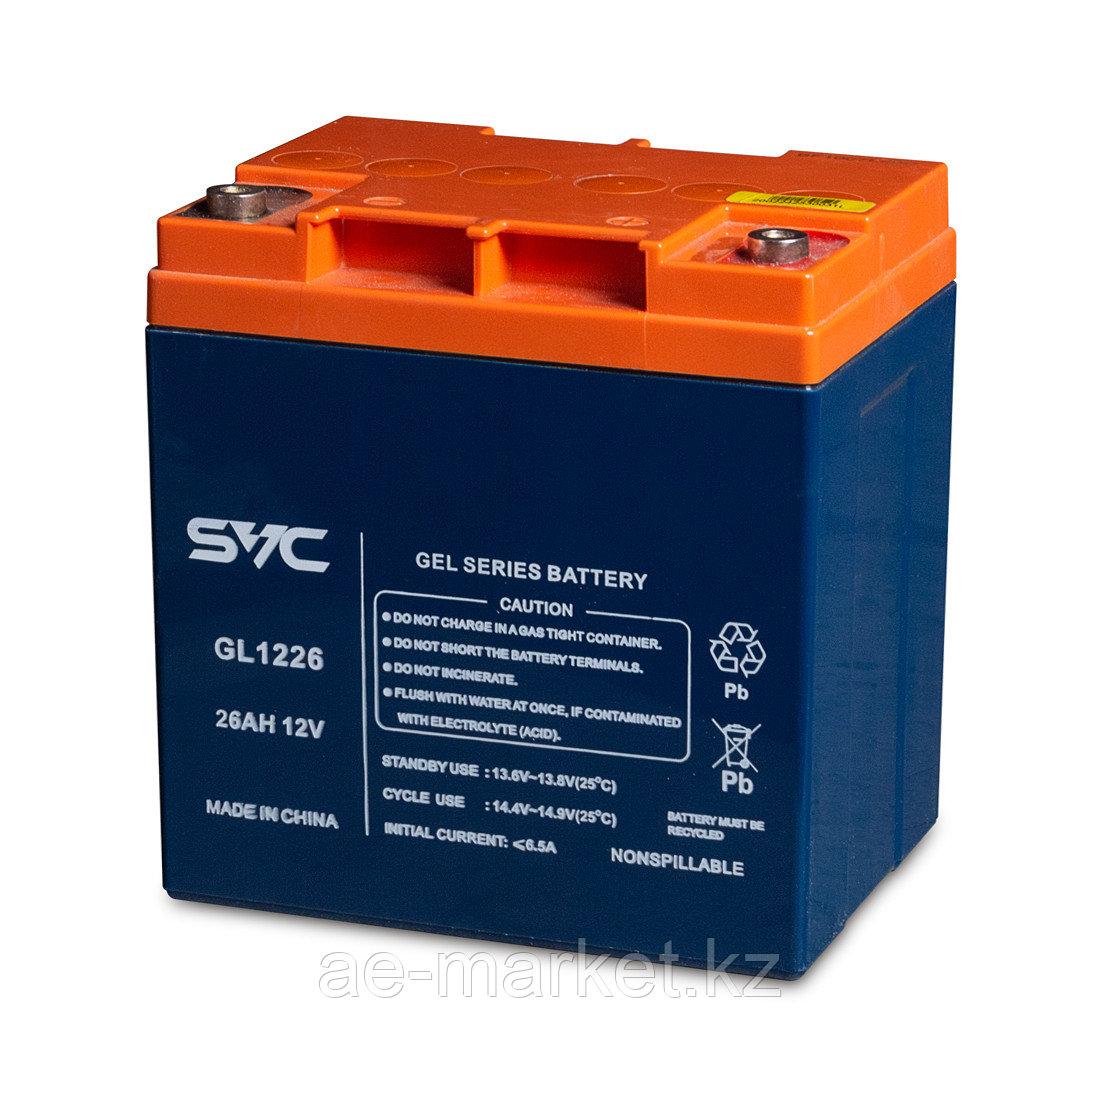 Аккумуляторная батарея SVC GL1226 12В 26 Ач (165*125*175)